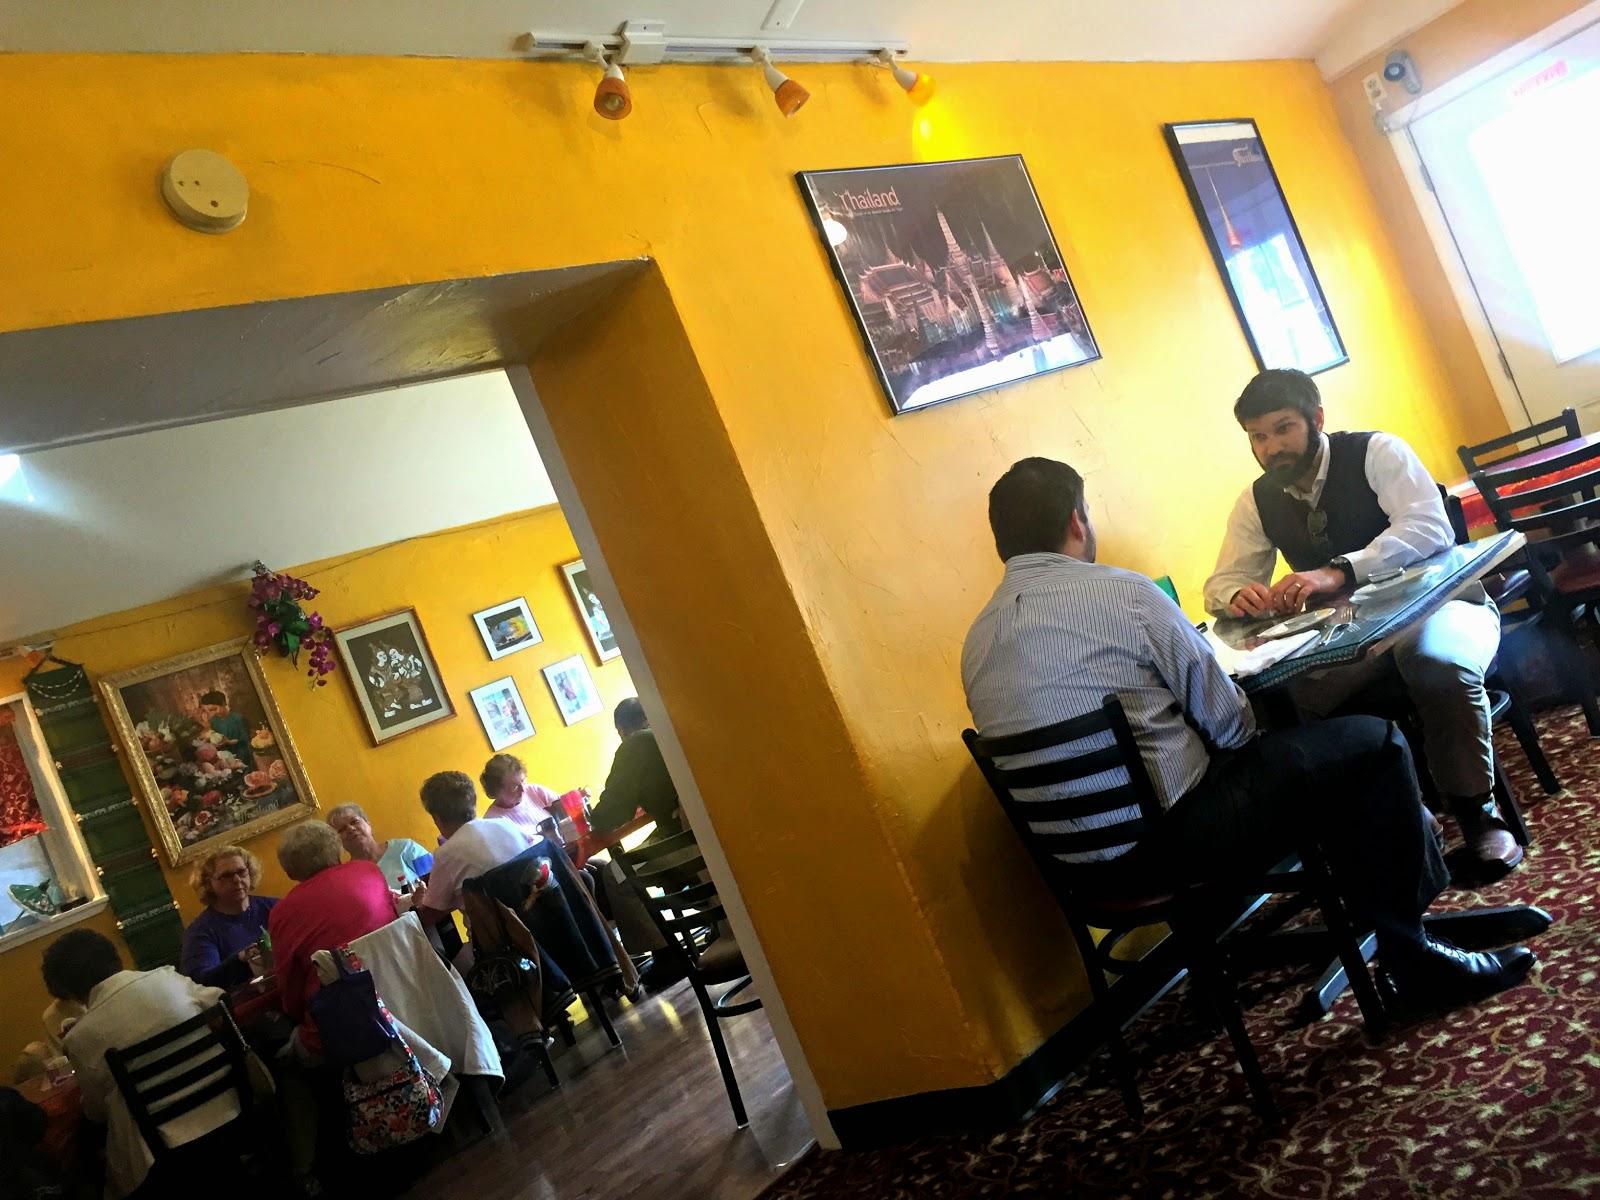 Chinese Restaurant In Bellevue Ky